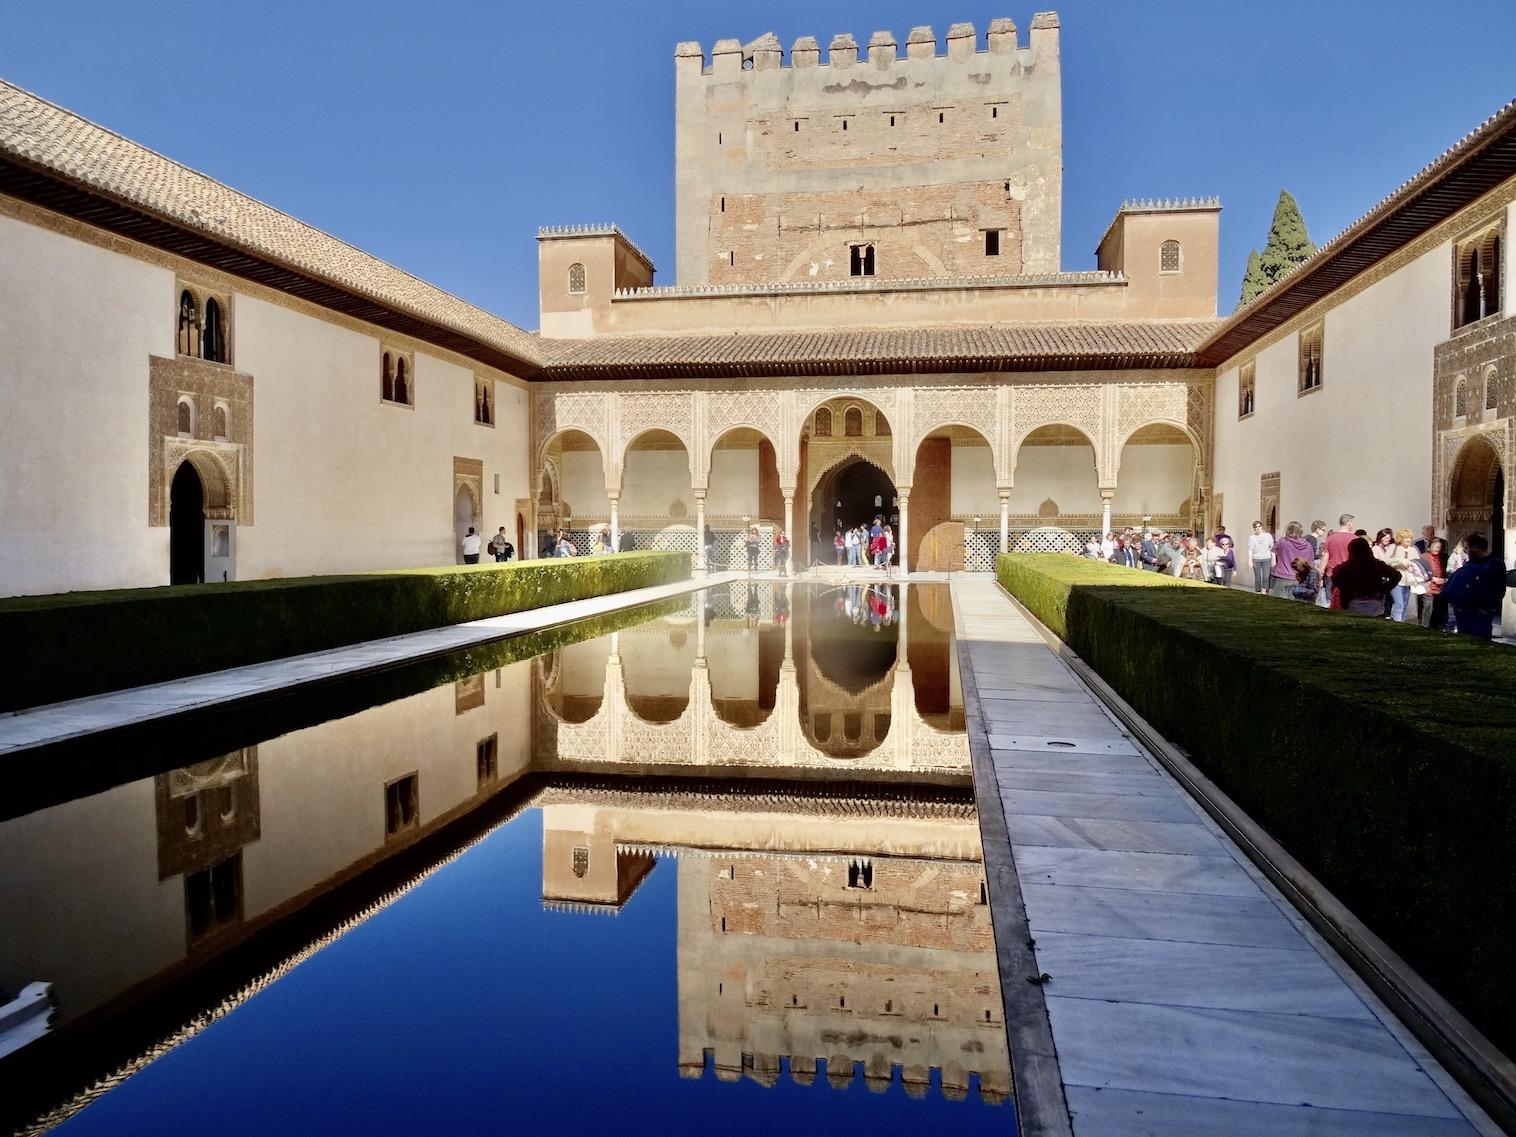 The Alhambra Granada Spain.